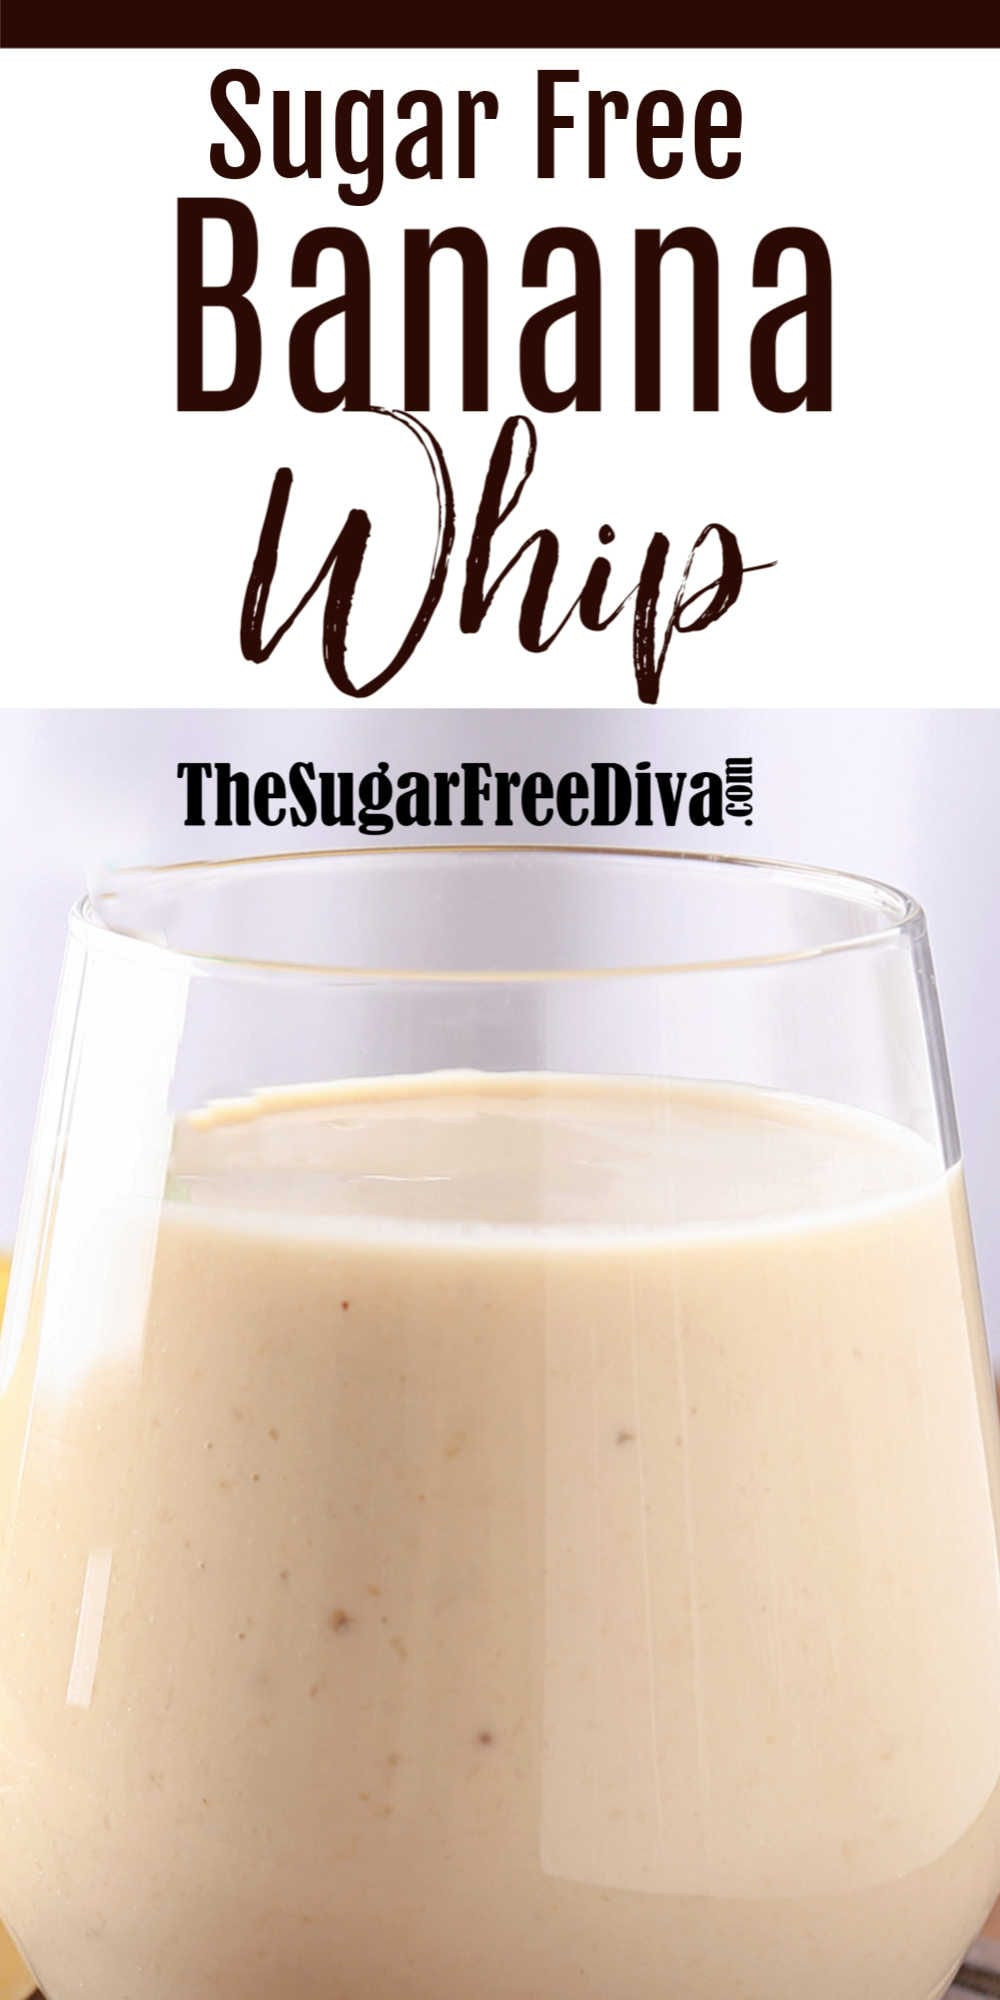 Sugar Free Banana Whip